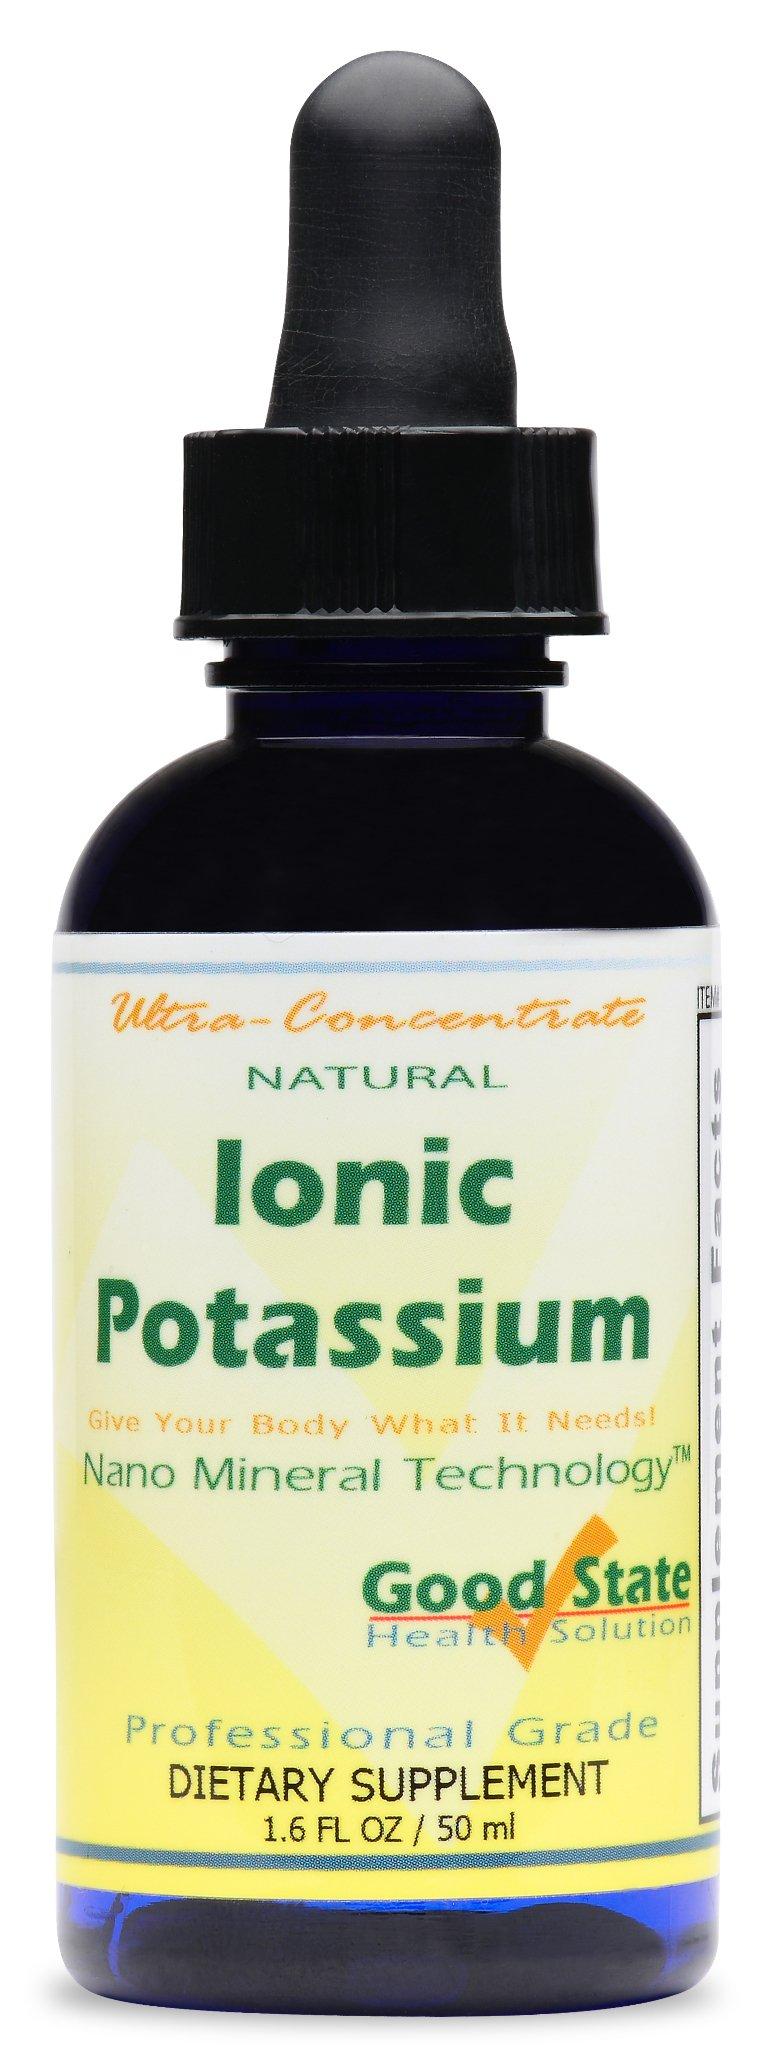 Good State Liquid Ionic Minerals - Potassium Ultra Concentrate - (10 drops equals 50 mg) (100 servings per bottle) Dietary Supplement 1.6 Fl.oz/50ml